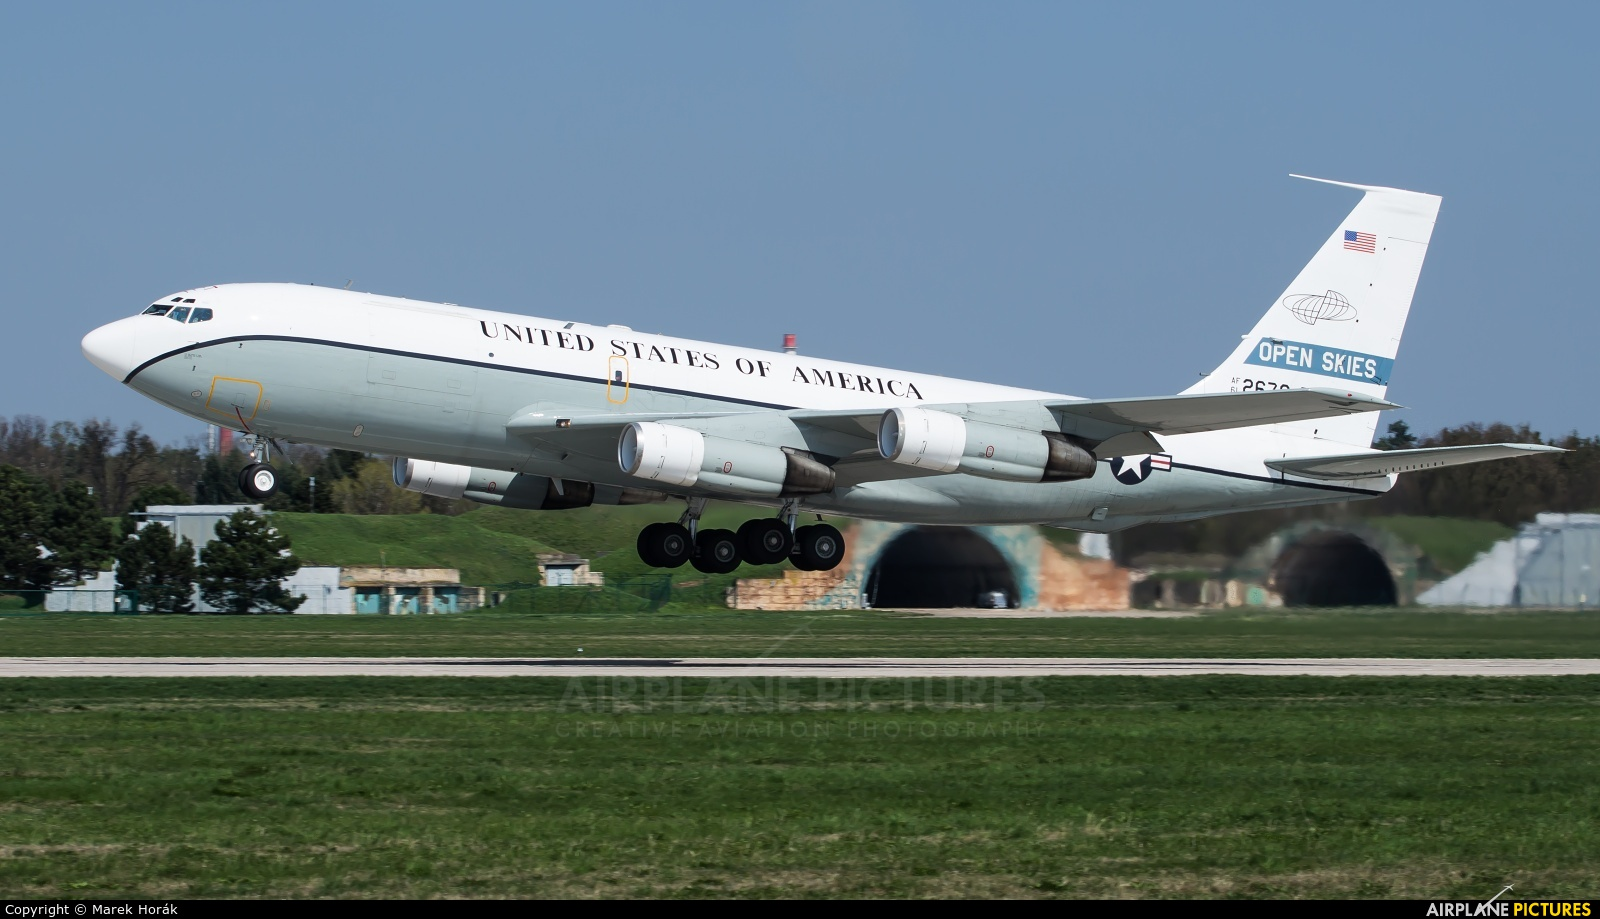 USA - Air Force 61-2670 aircraft at Pardubice